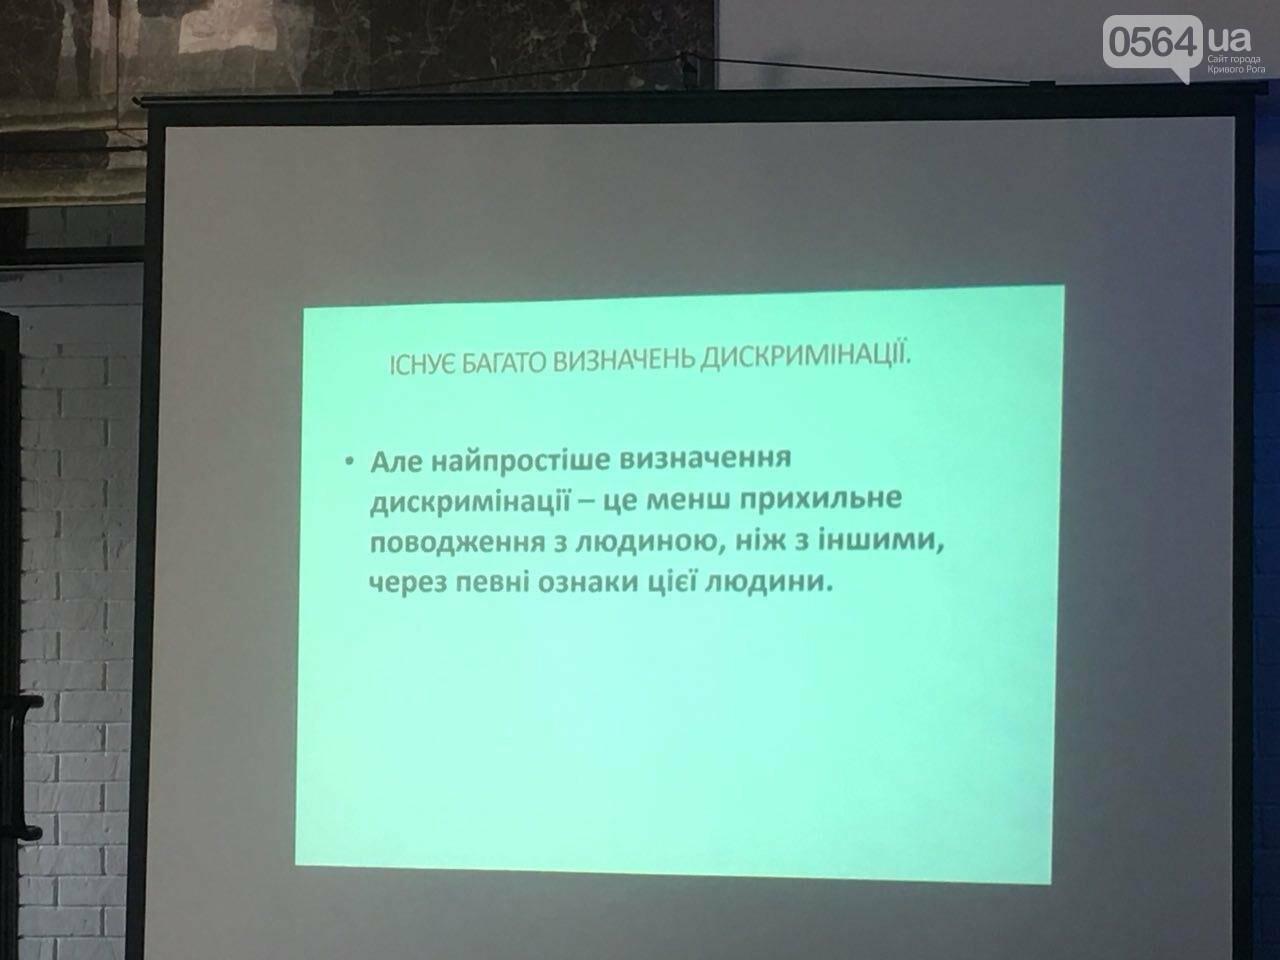 На тренинге о ВИЧ и медреформе криворожским журналистам рассказали о дискриминации и стереотипах, - ФОТО , фото-19